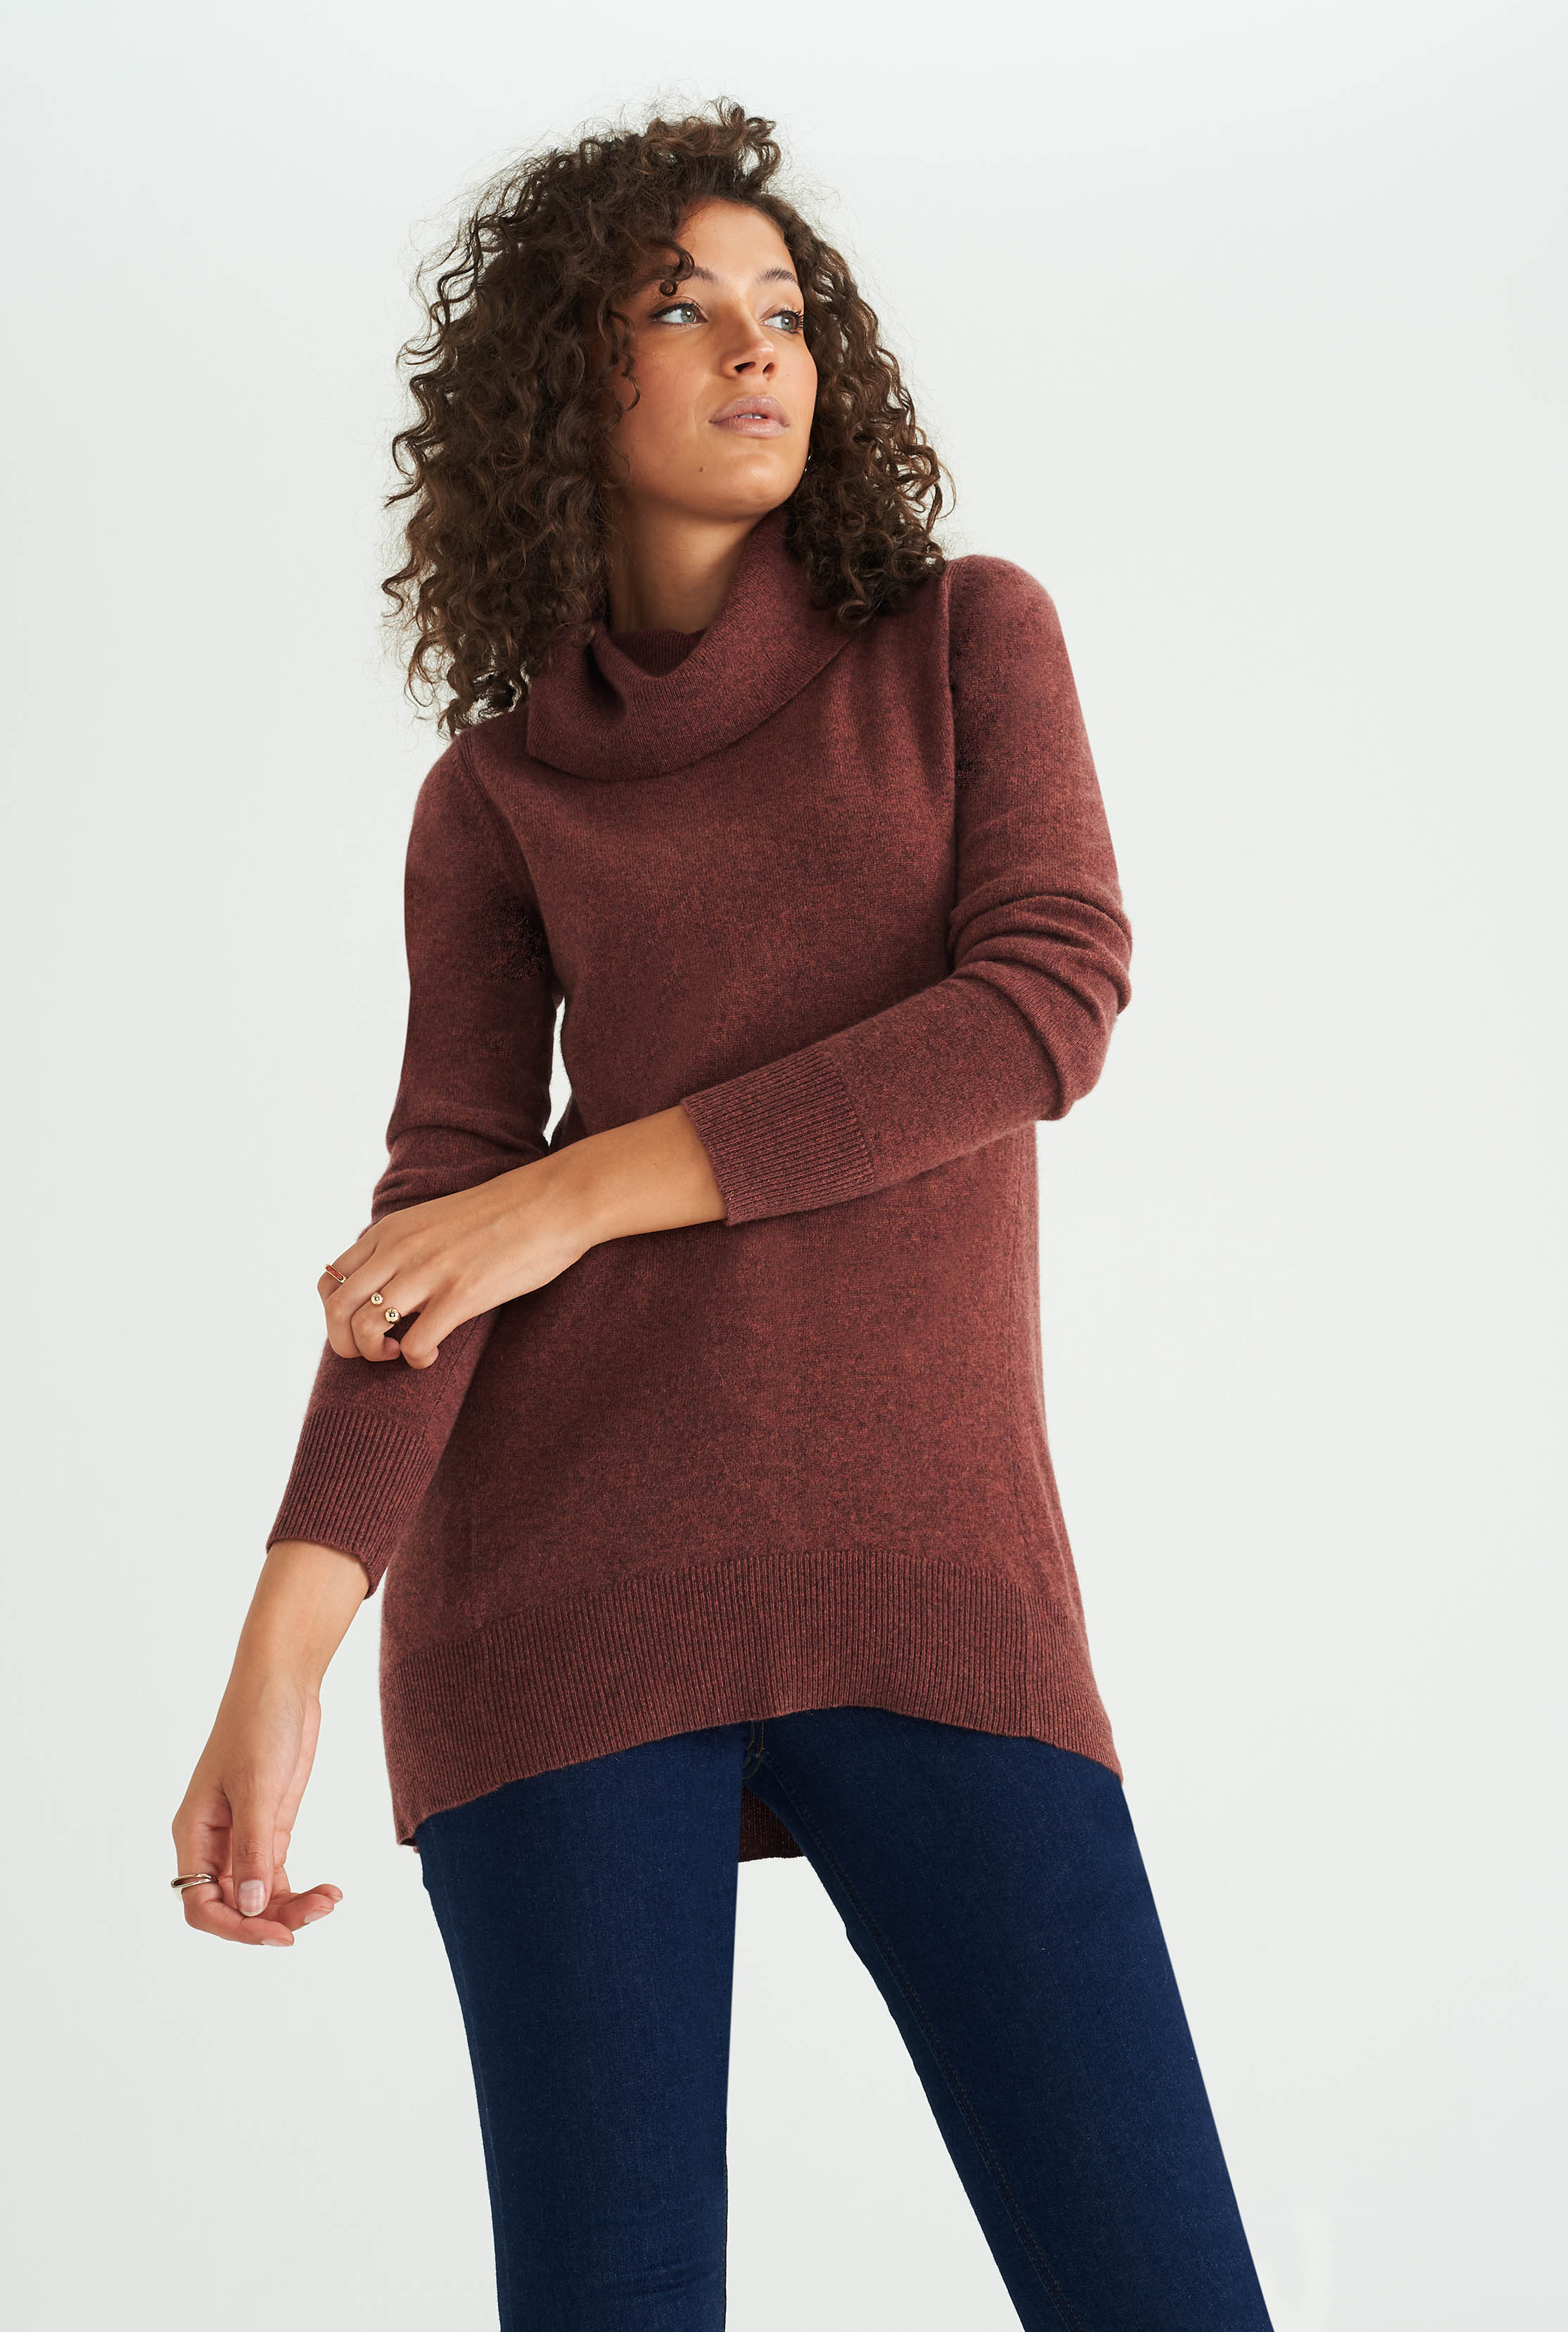 Chestnut Cashmere Cowl Neck Sweater